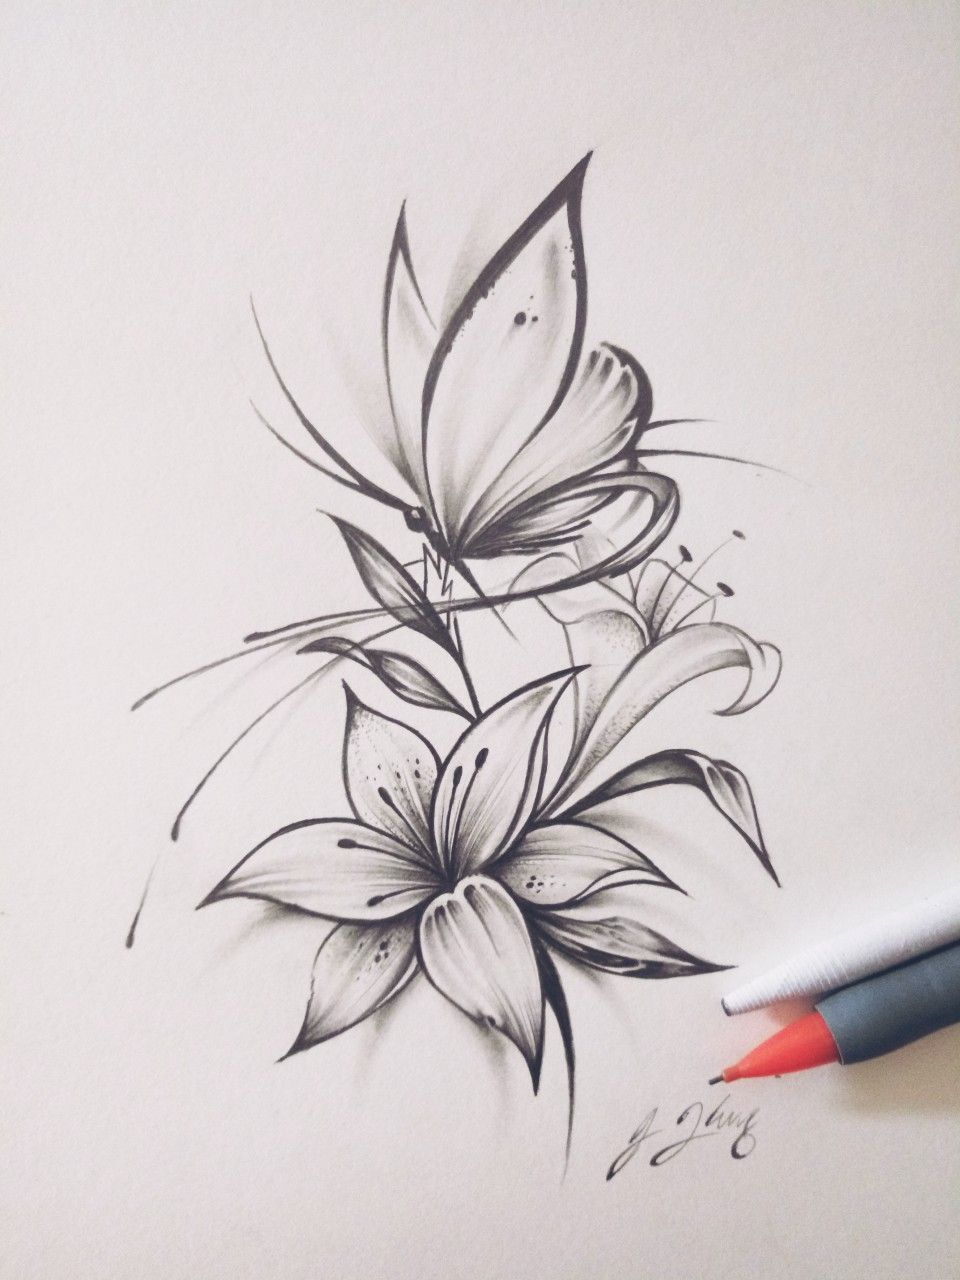 Butterfly Flower Tattoo Design 560627853614061391 Vintage Flower Tattoo Butterfly Tattoo Designs Flower Tattoo